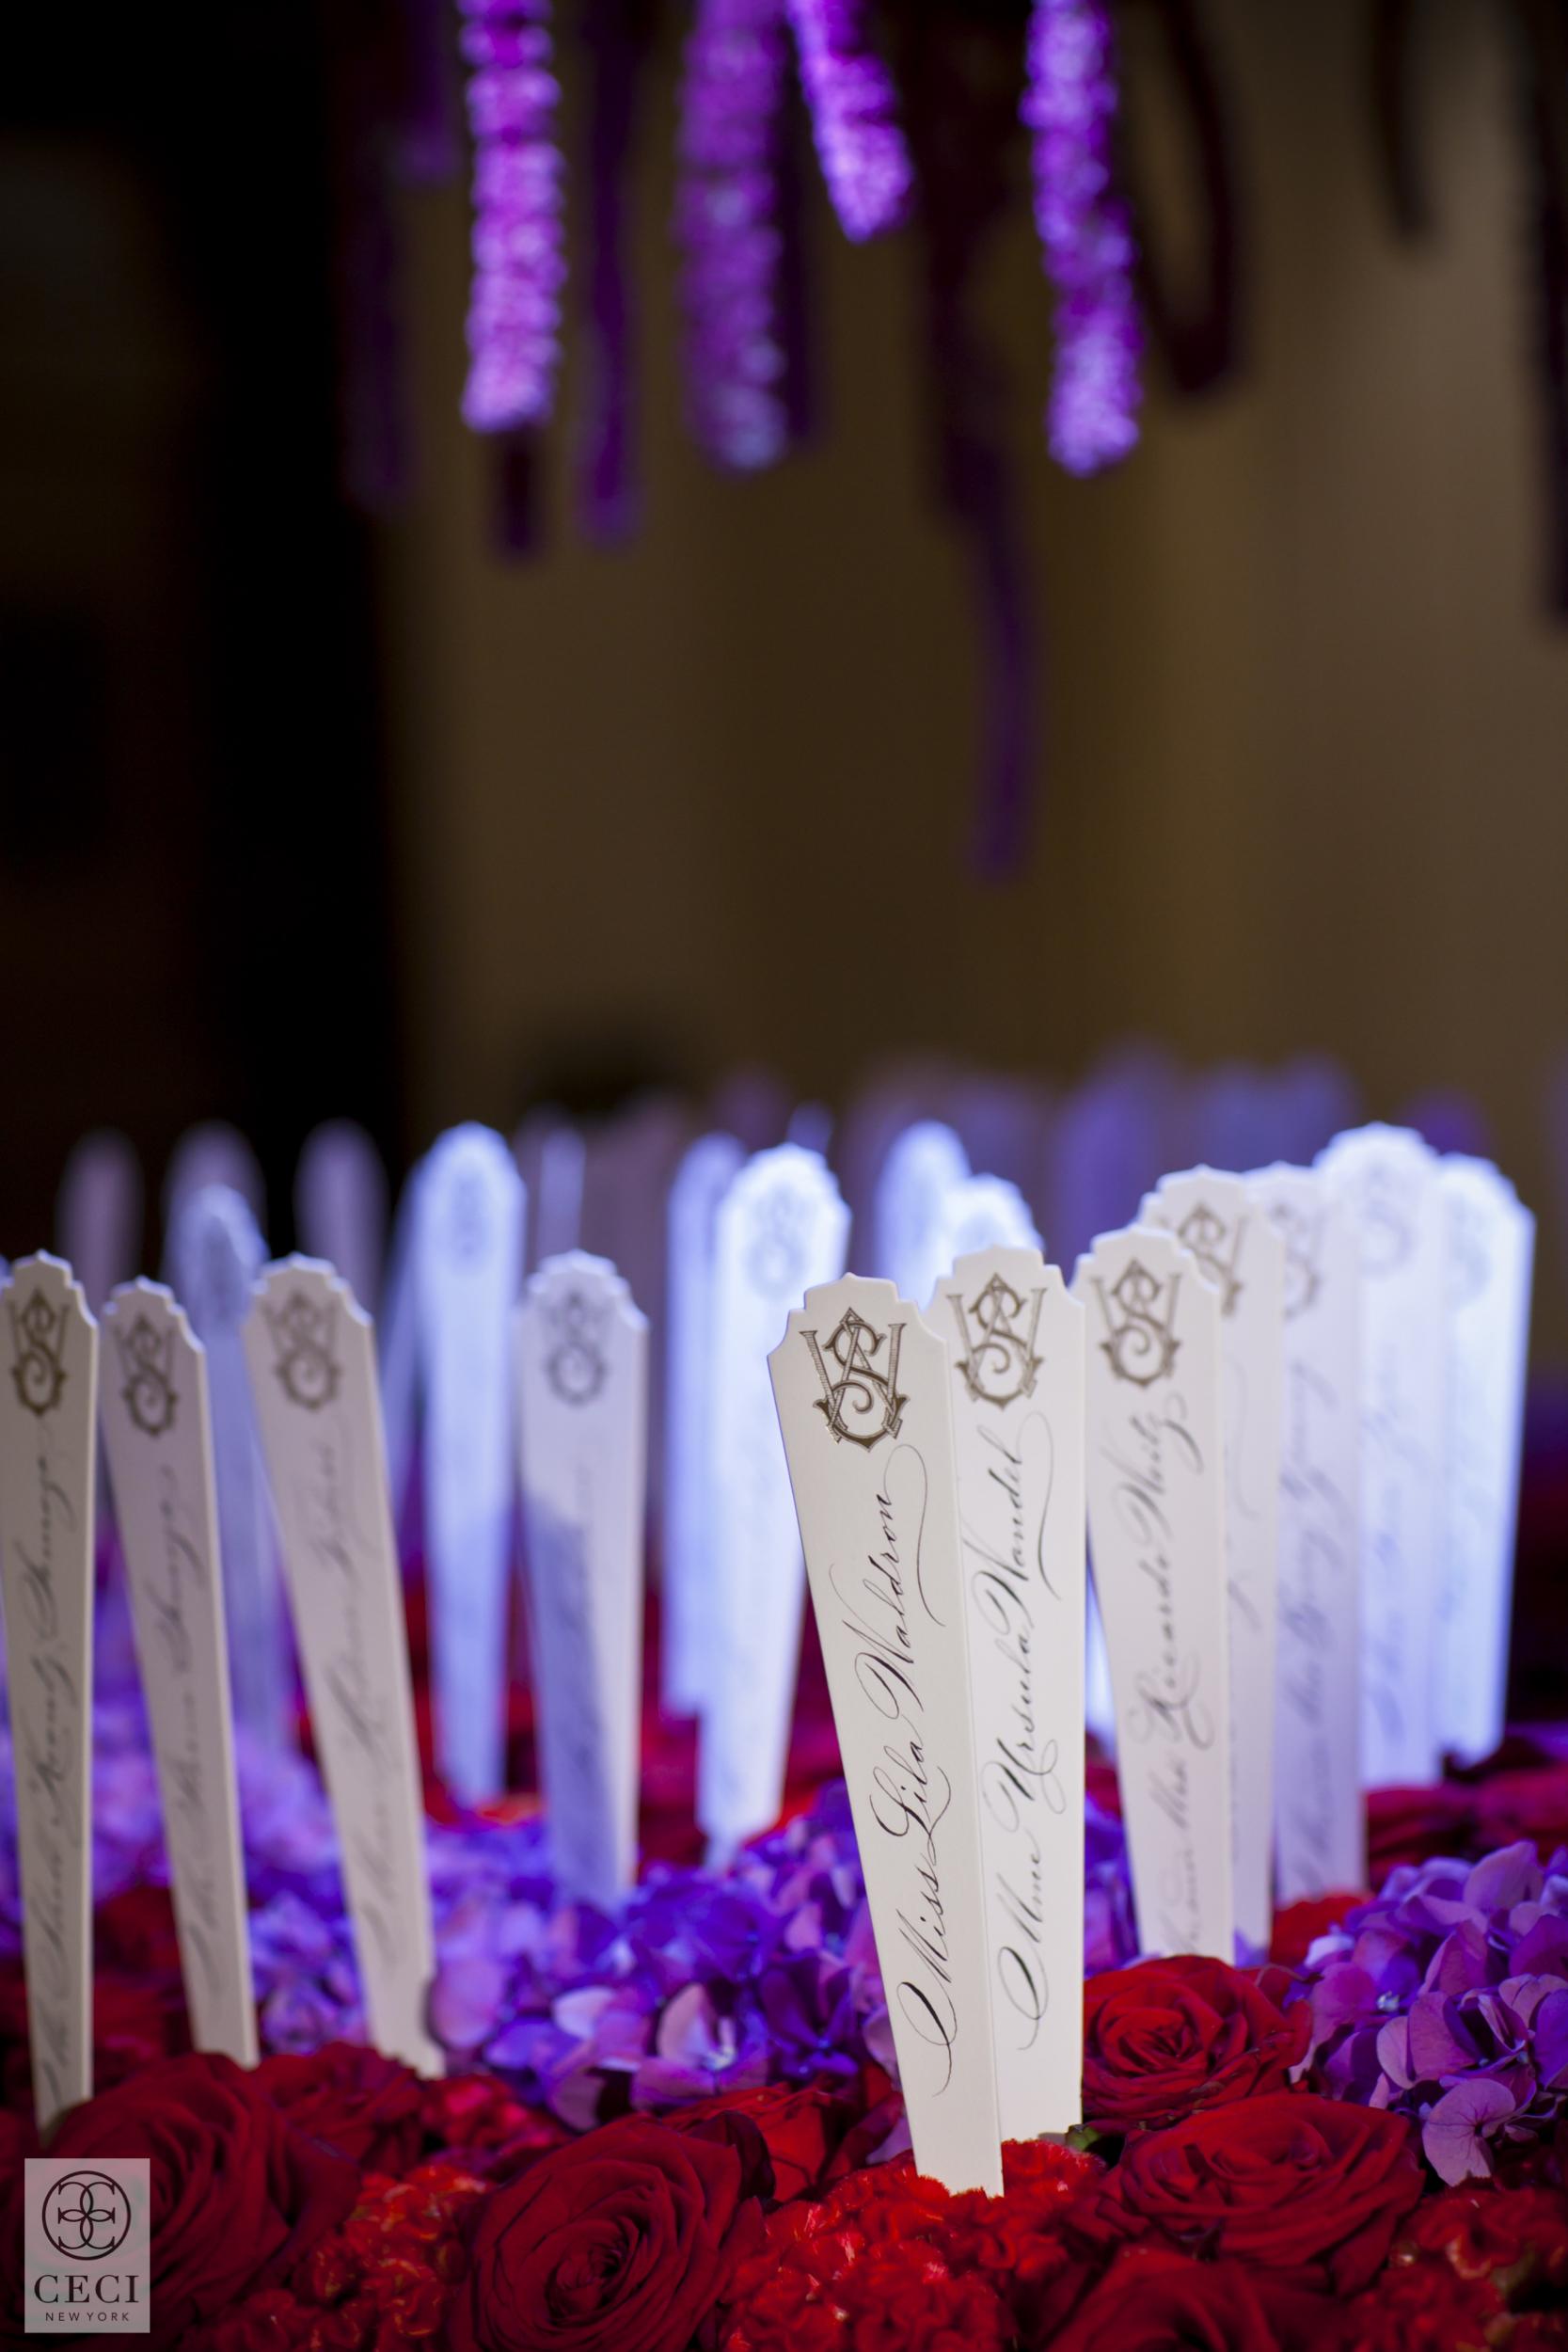 ceci_new_york_lucas_somoza_purple_regal_wediding_birthday_commitment_ceremony_invitation_logo_branding_perfume_gold_-2.jpg